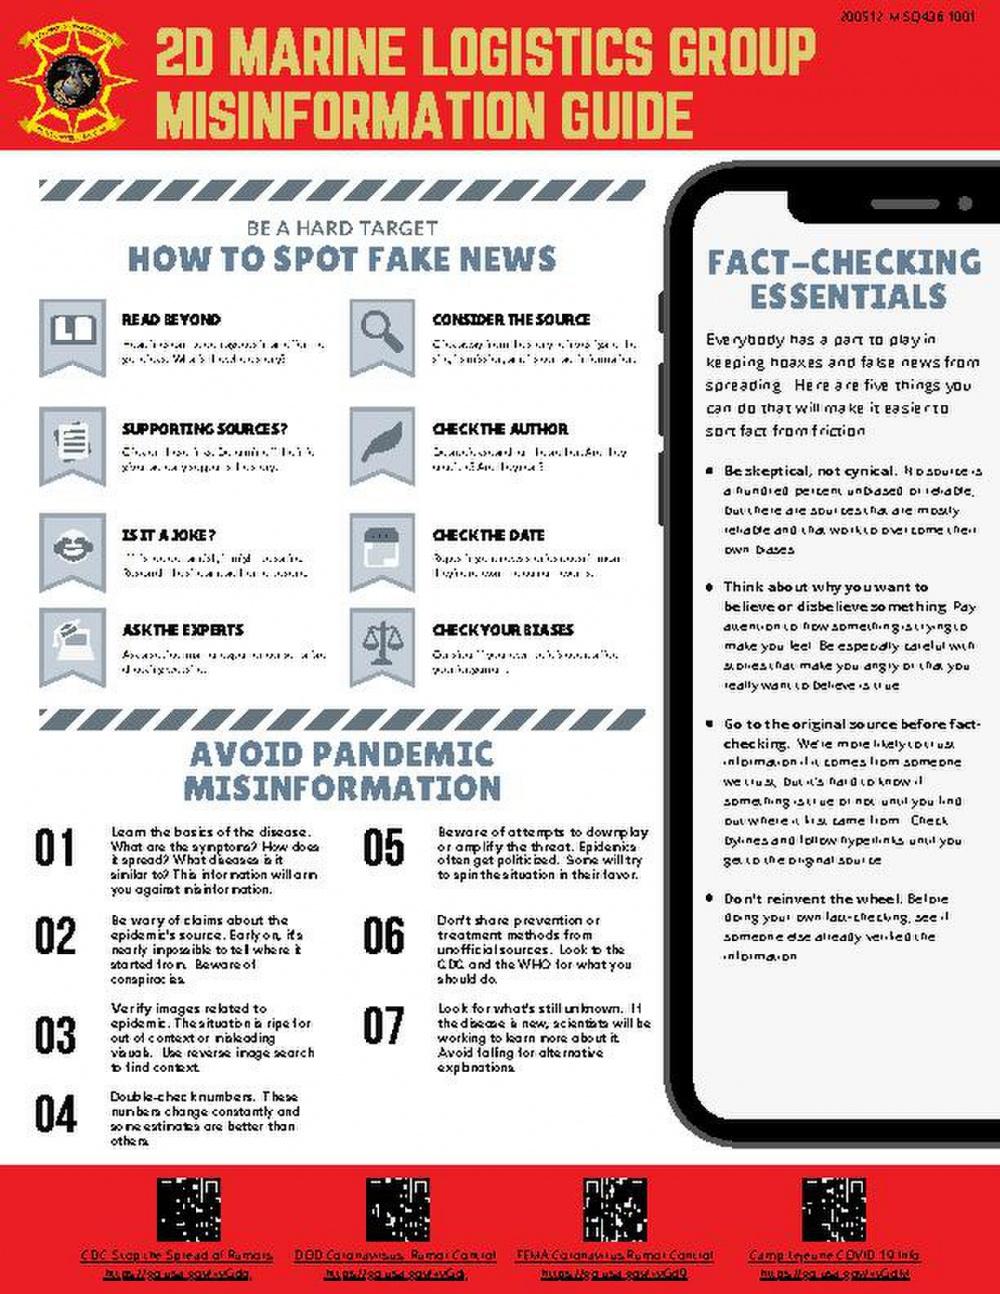 Coronavirus Misinformation Guide